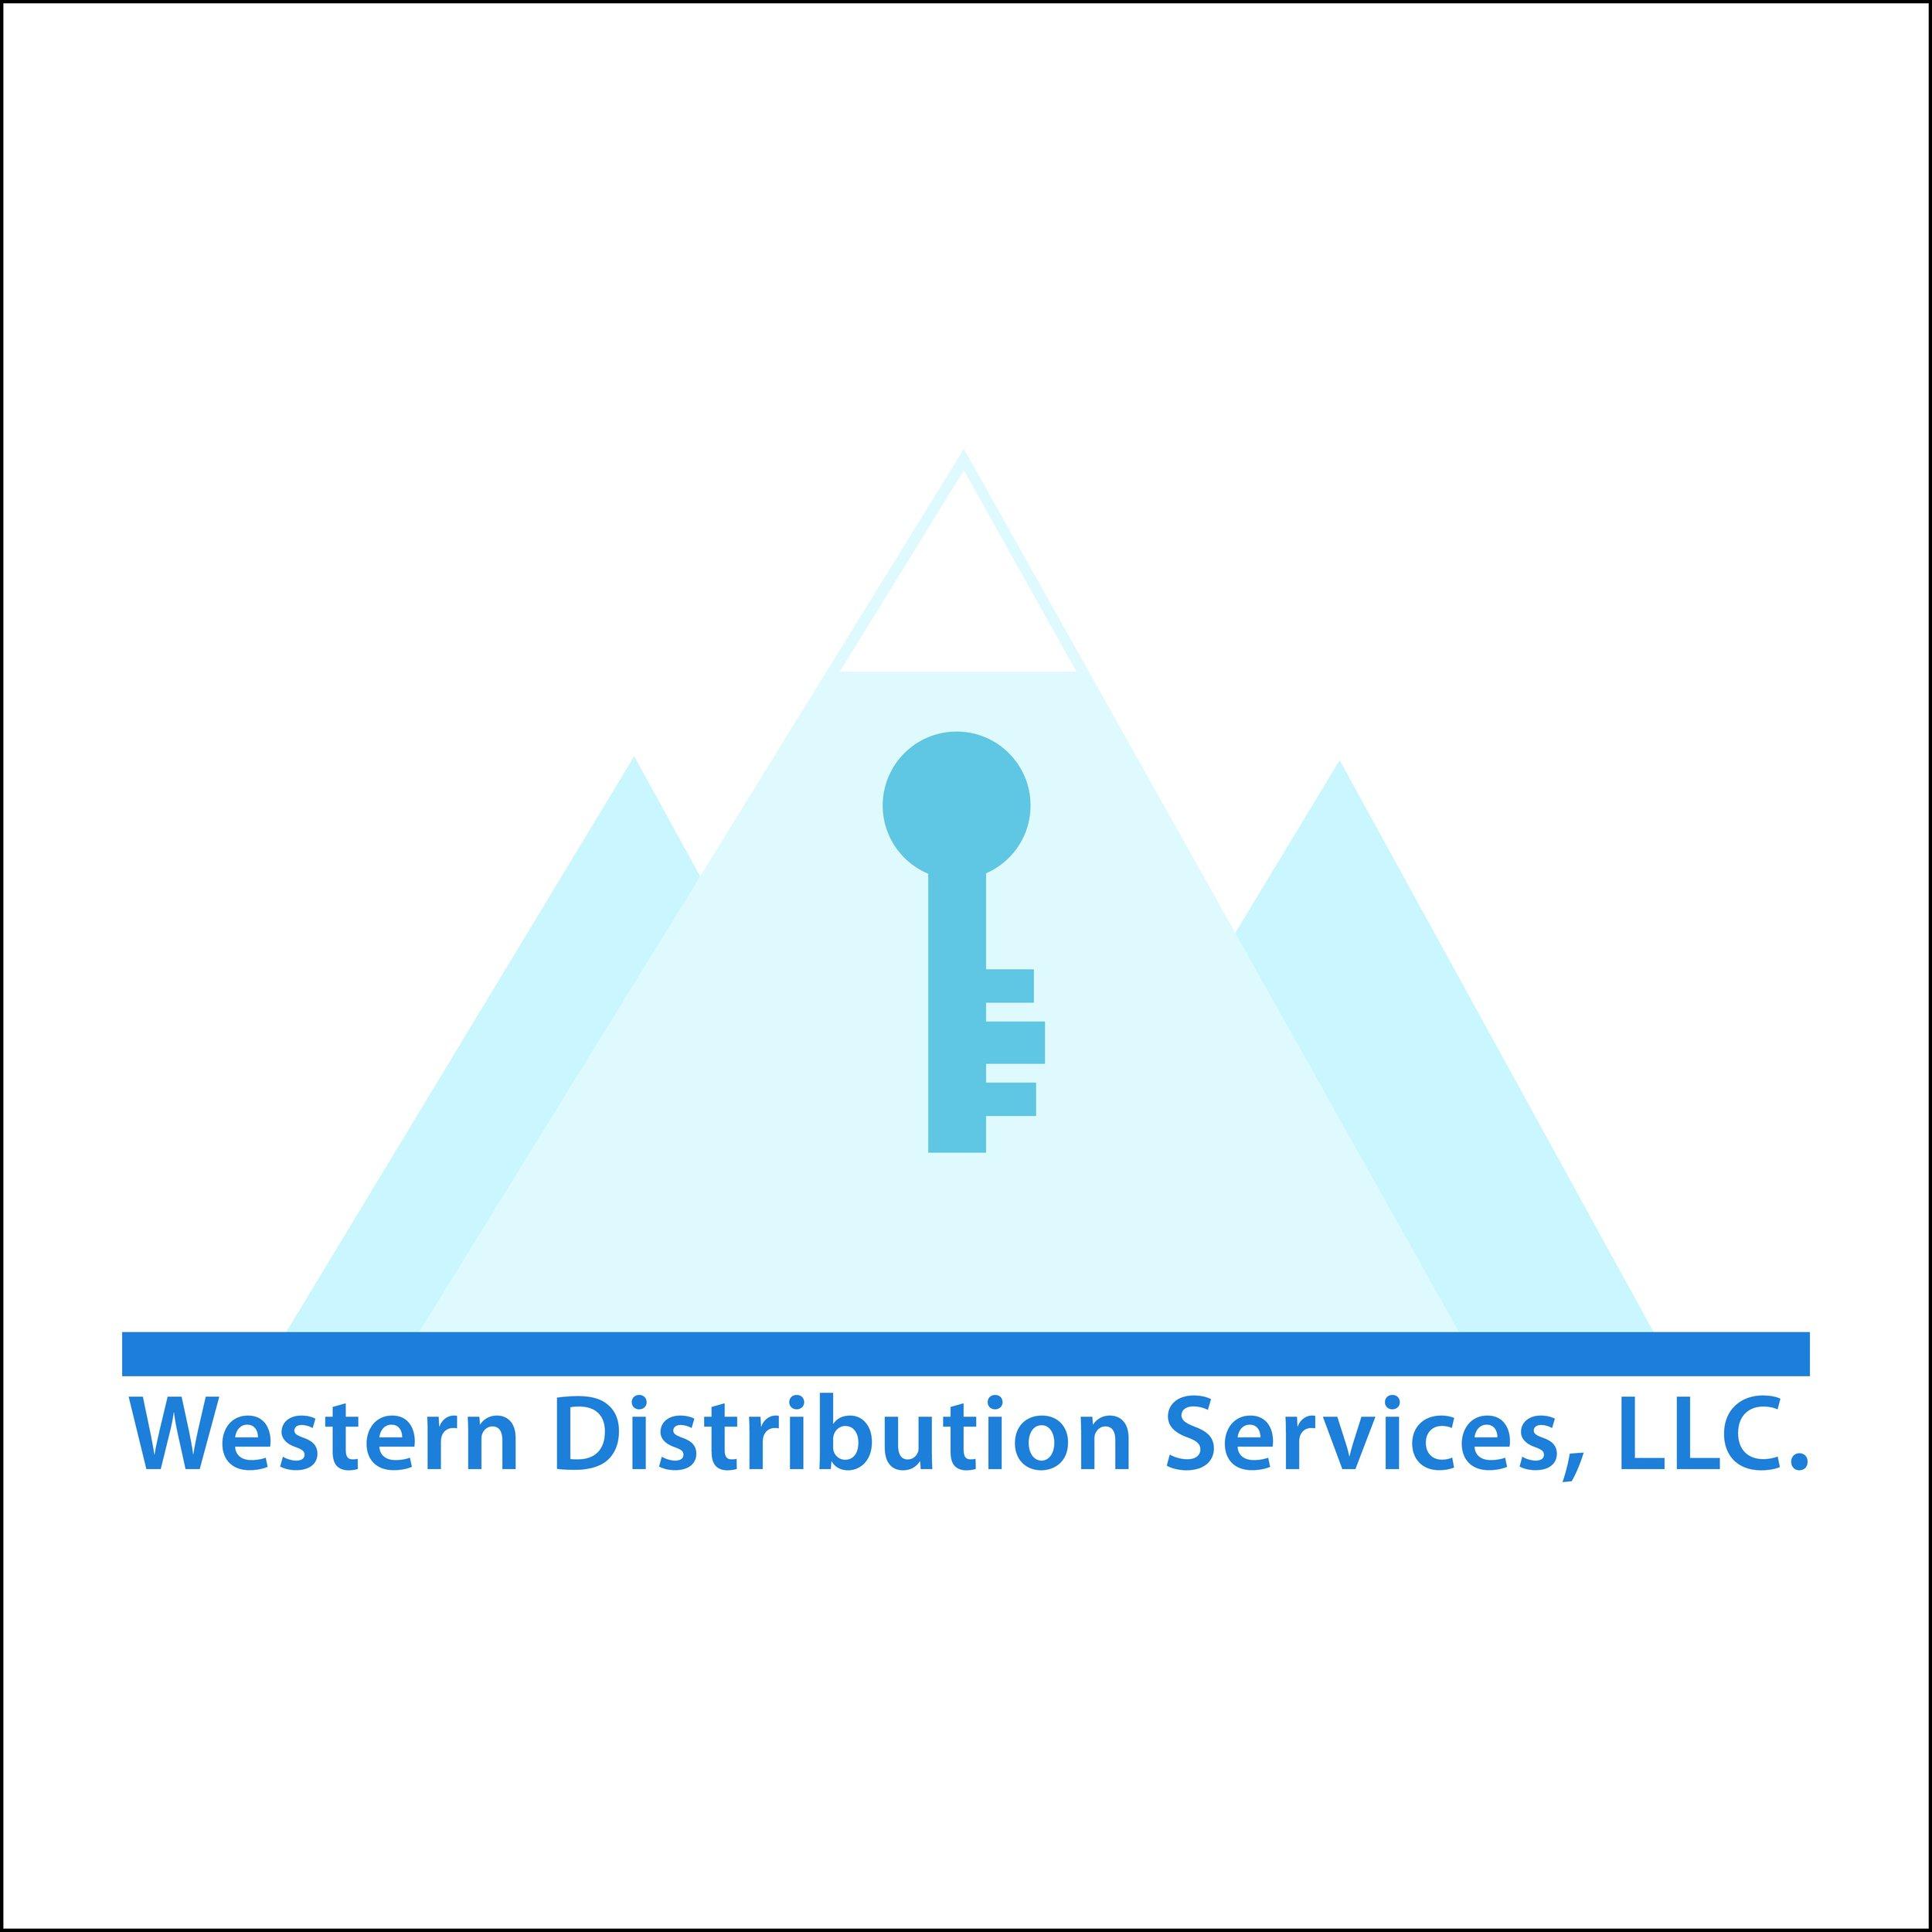 WDS_Logo_Dan.eps.jpg